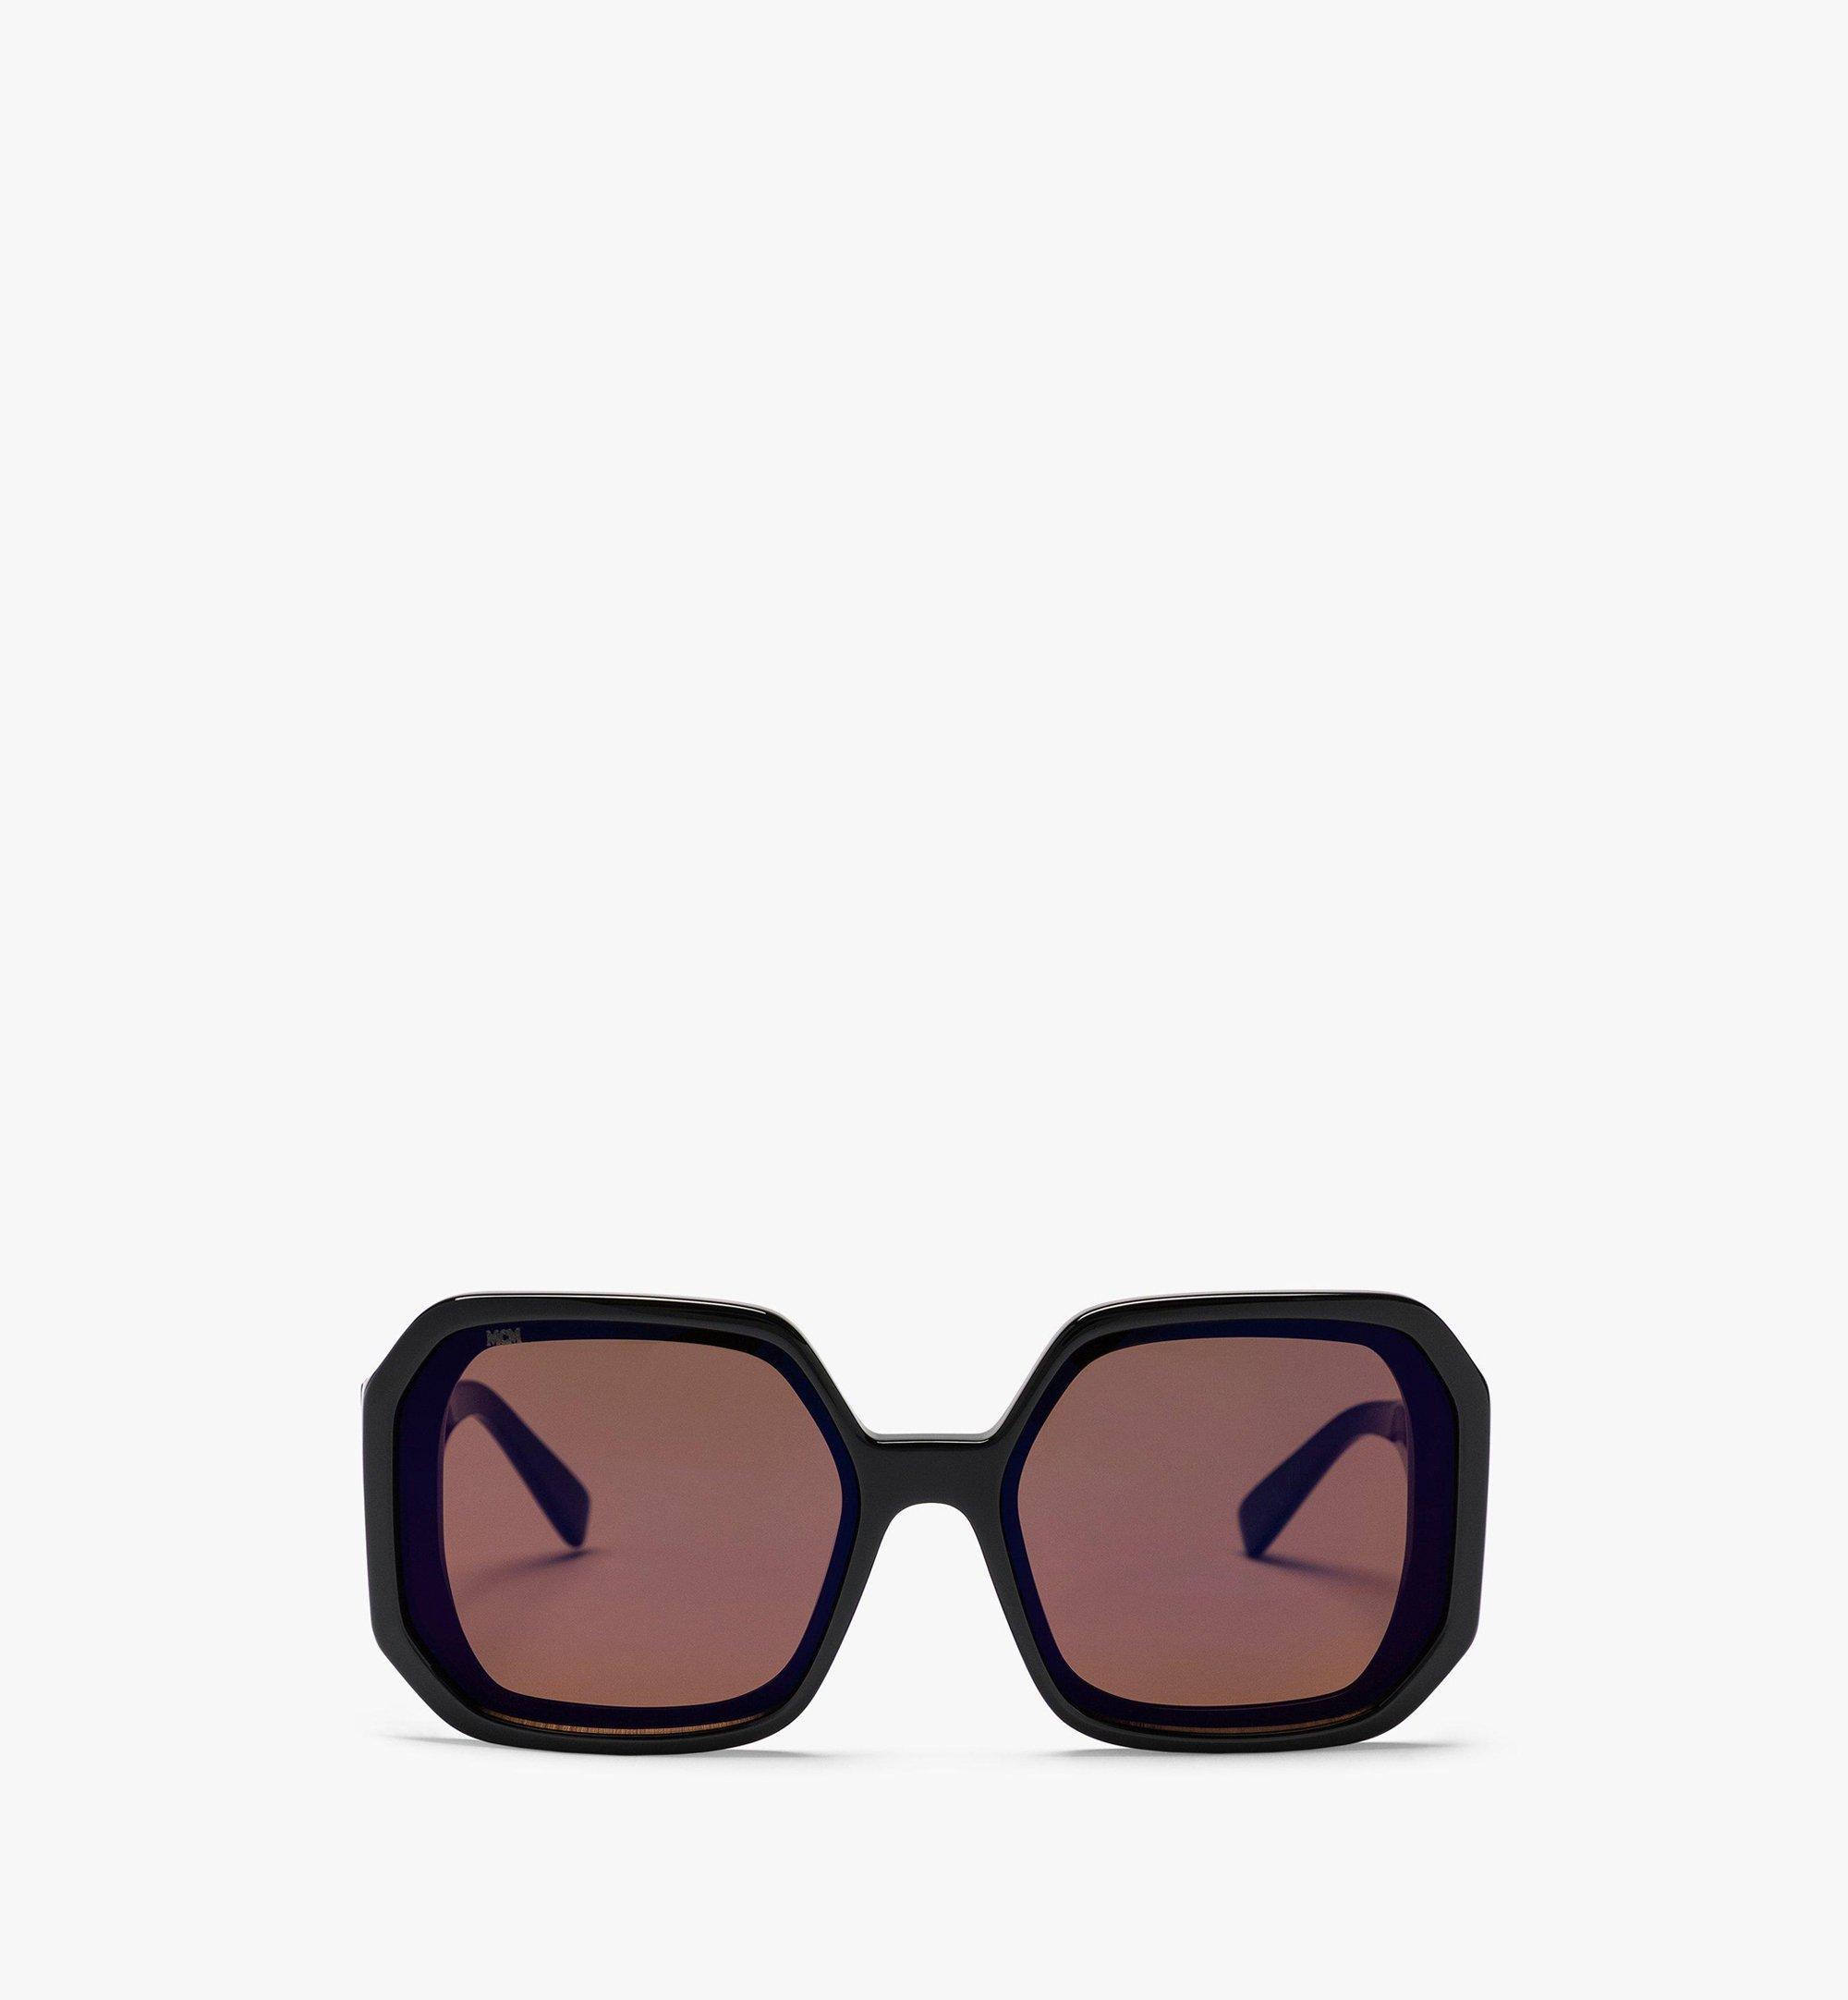 MCM MCM709S Geometric Sunglasses Black MEGBAMM05BW001 Alternate View 1